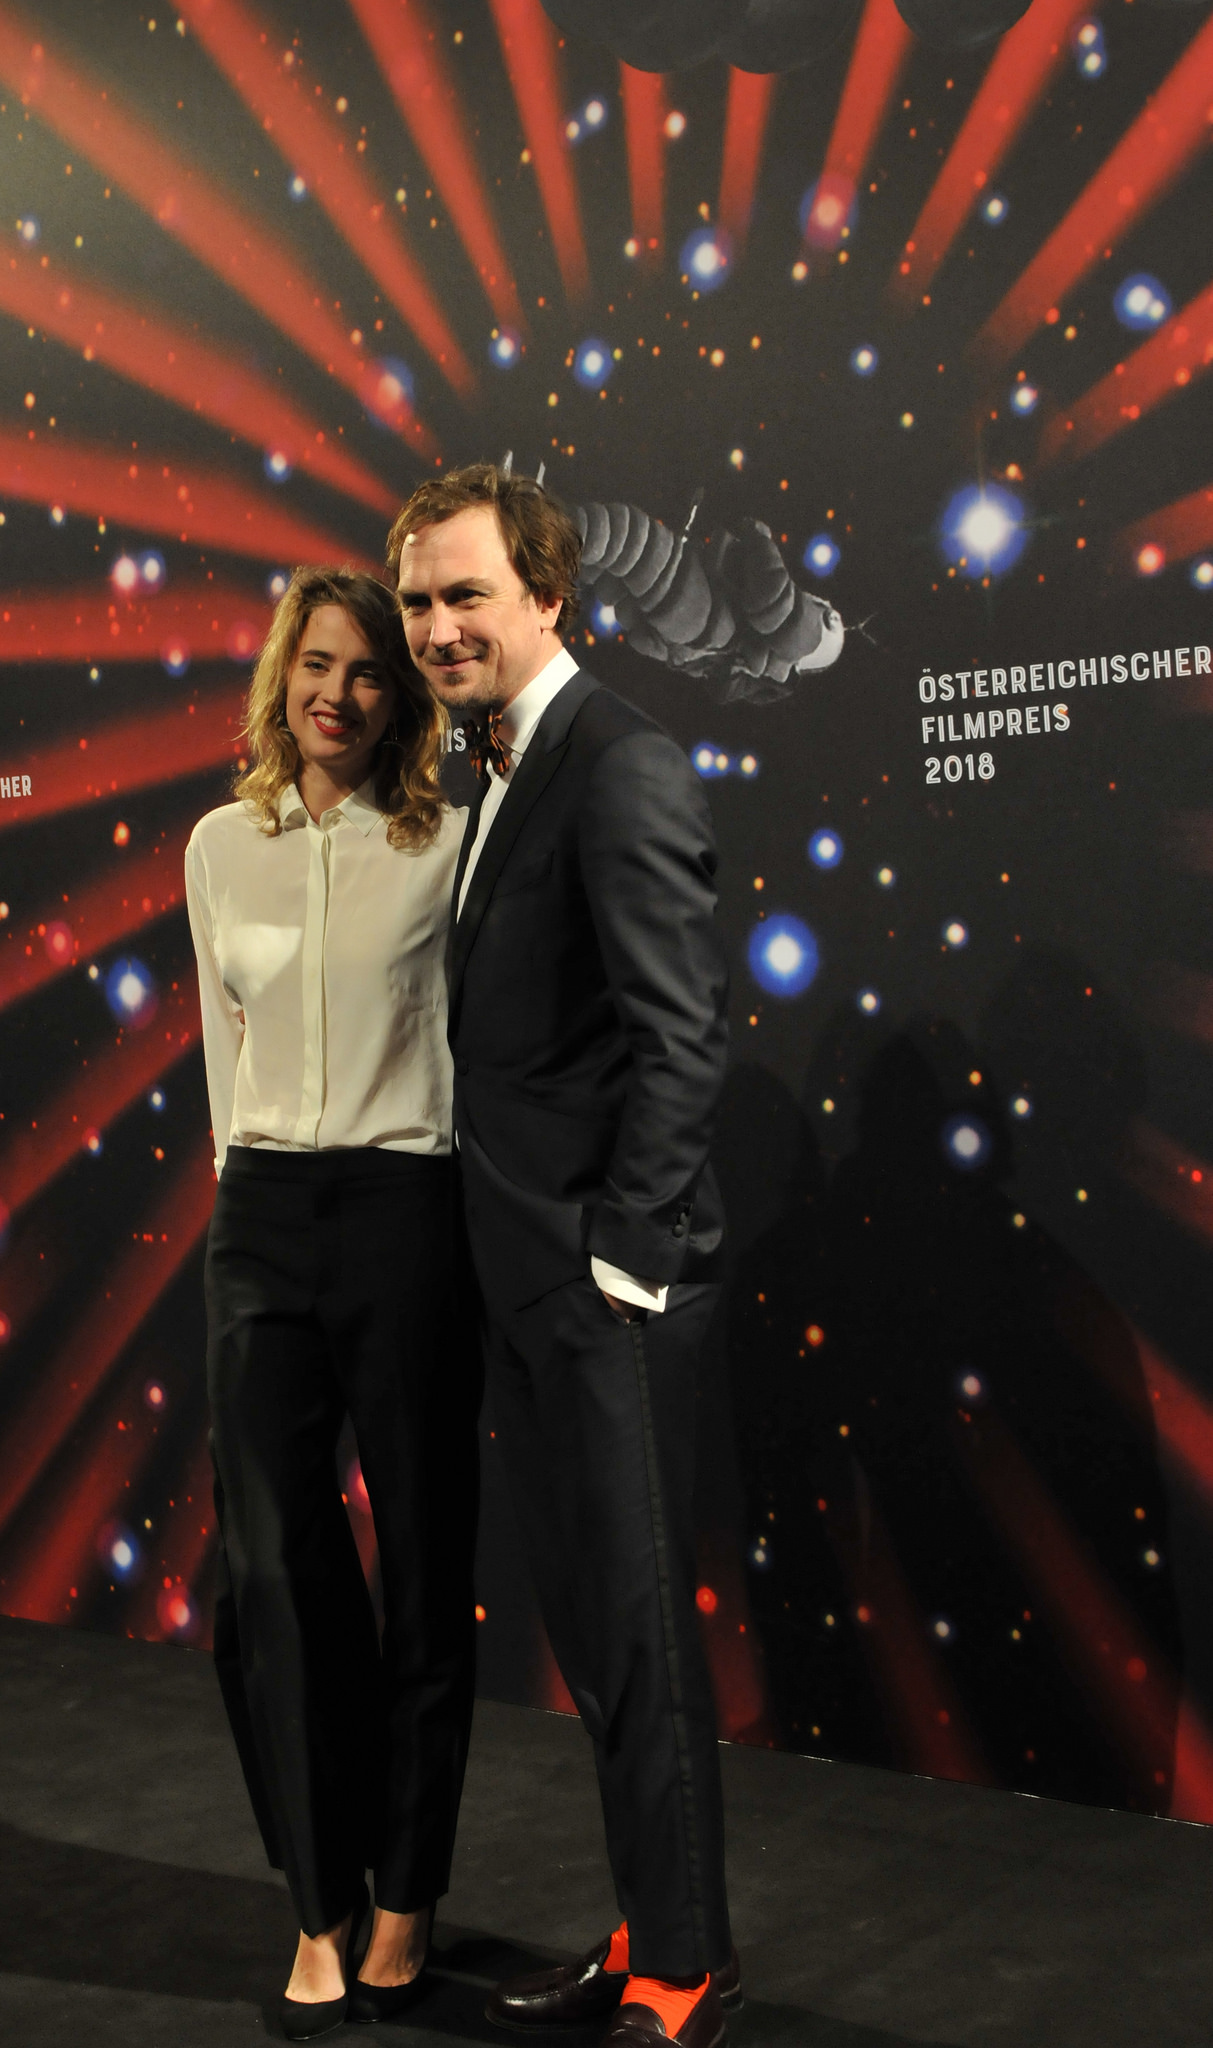 Österreichischer Filmpreis for Best Actor for Lars Eidinger in THE BLOOM OF YESTERDAY